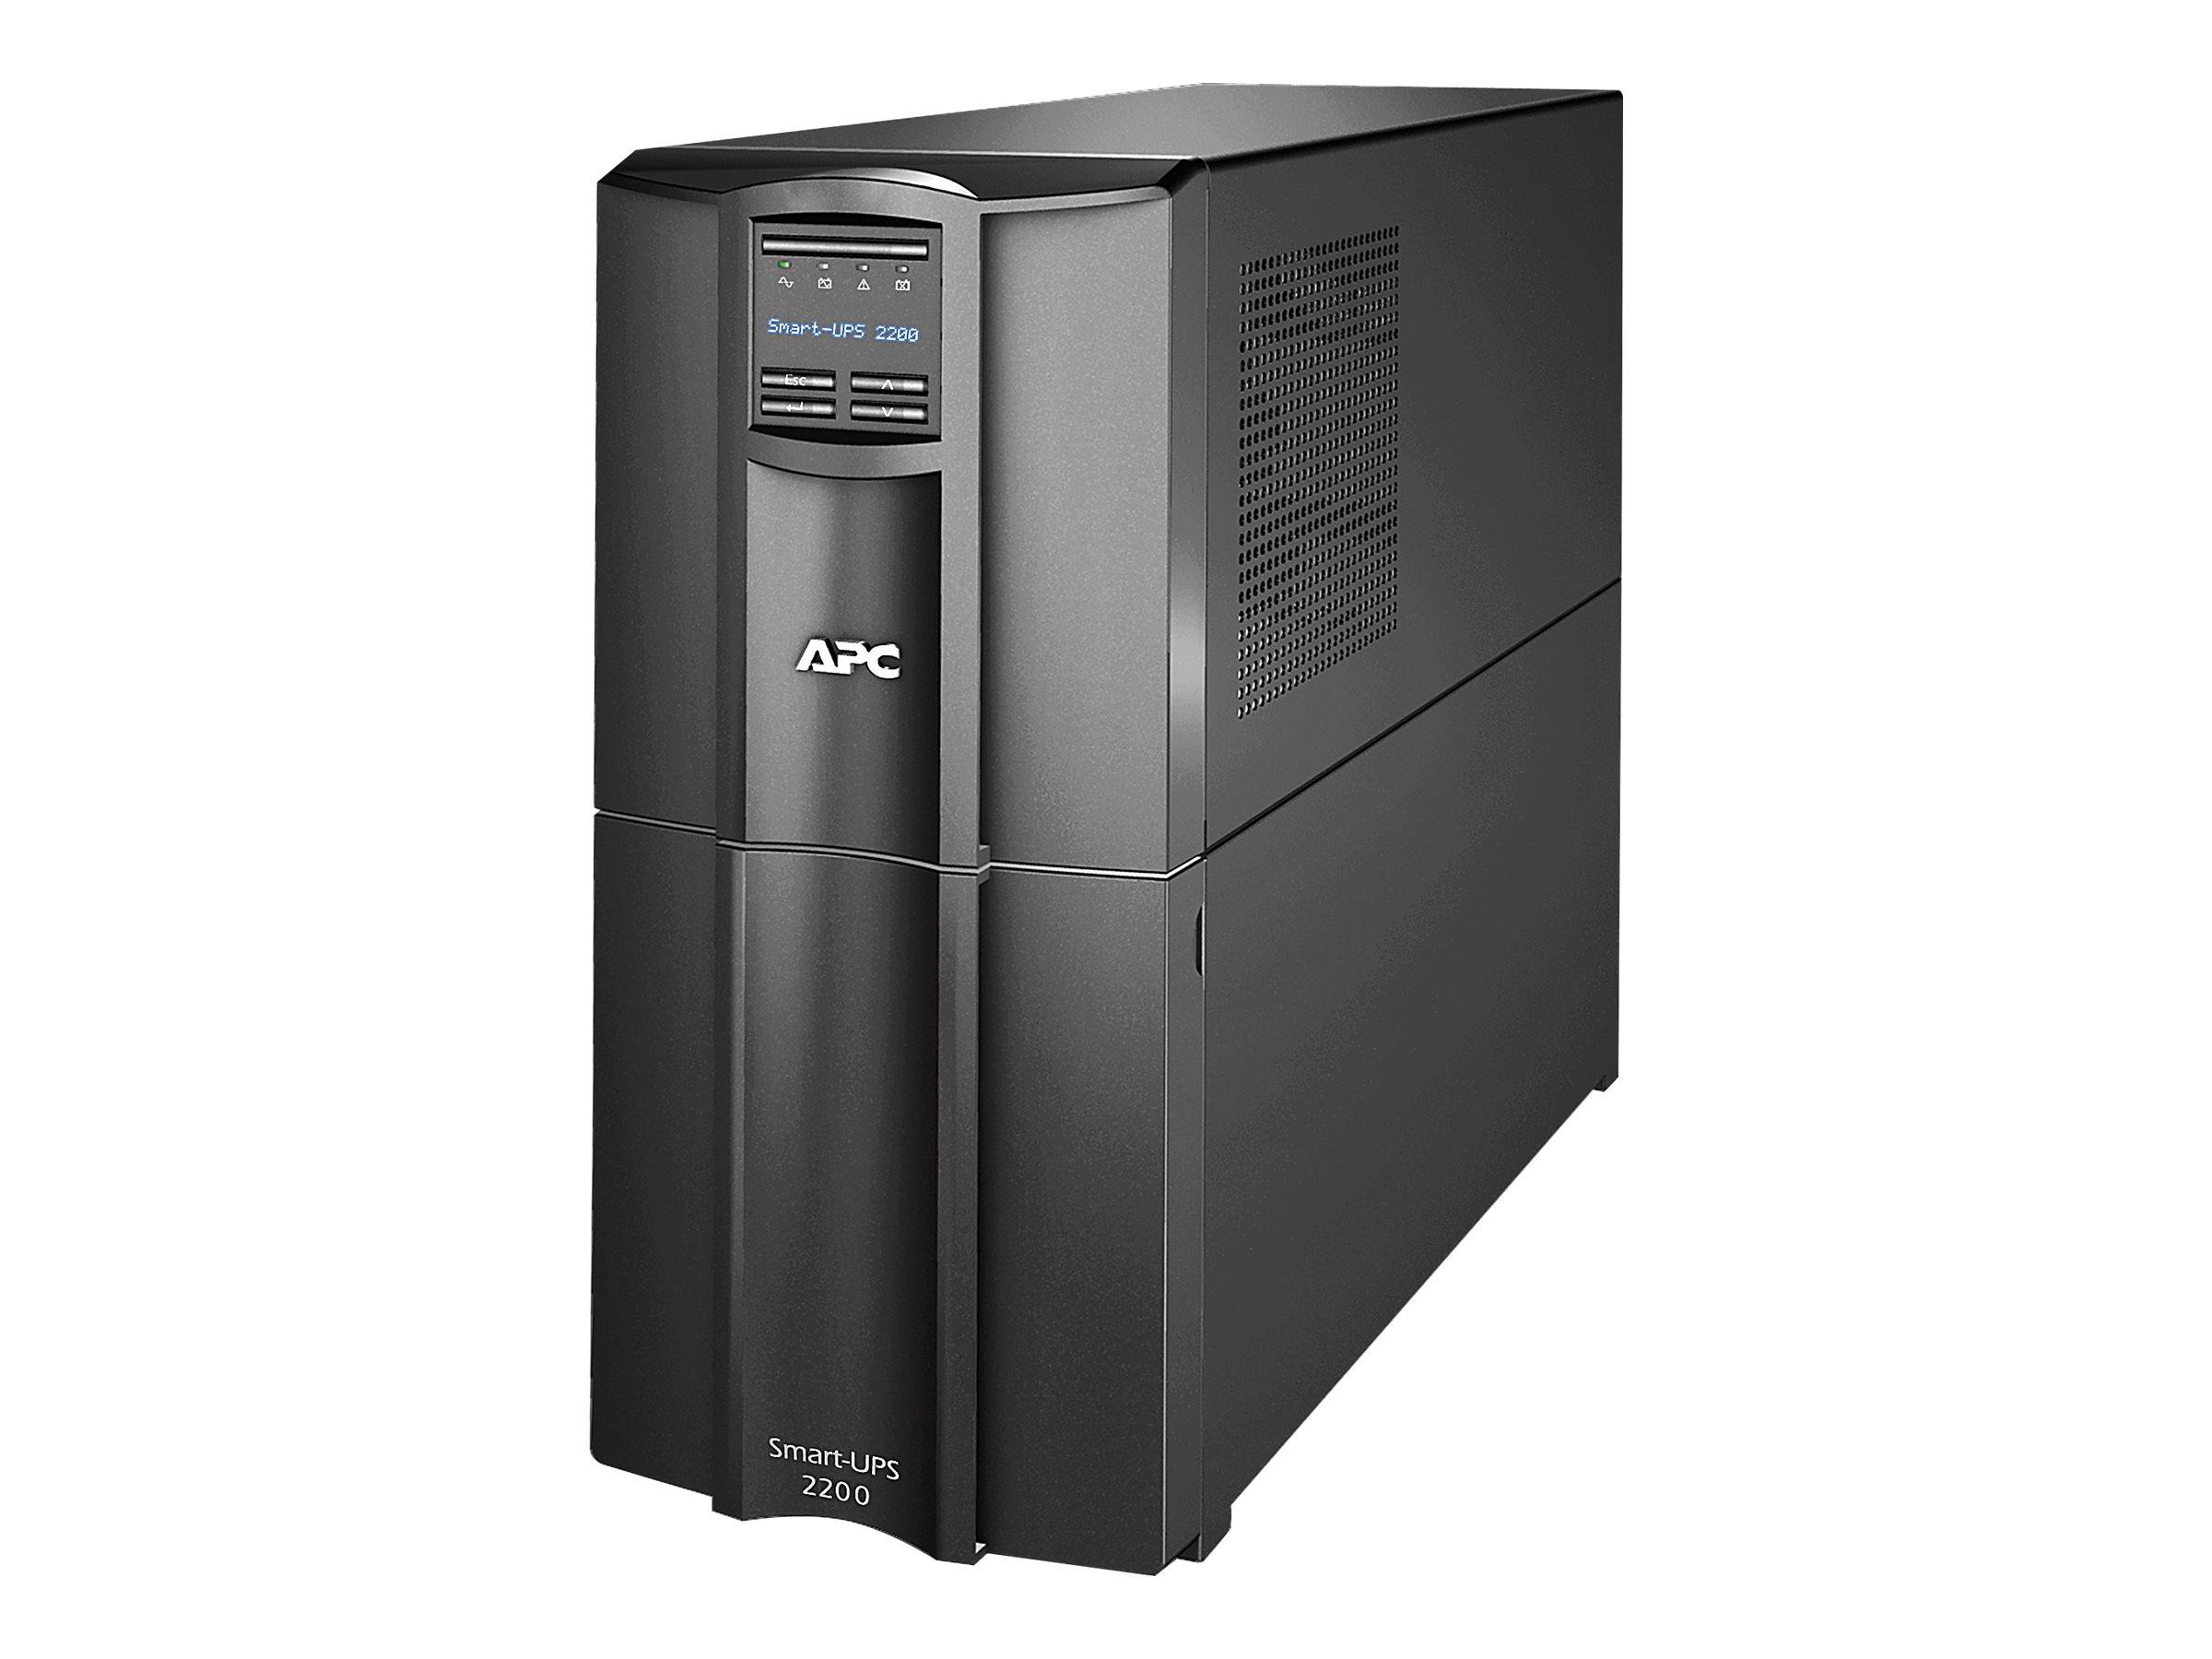 APC Smart-UPS SMT2200C - UPS - 1.98 kW - 2200 VA - with APC SmartConnect